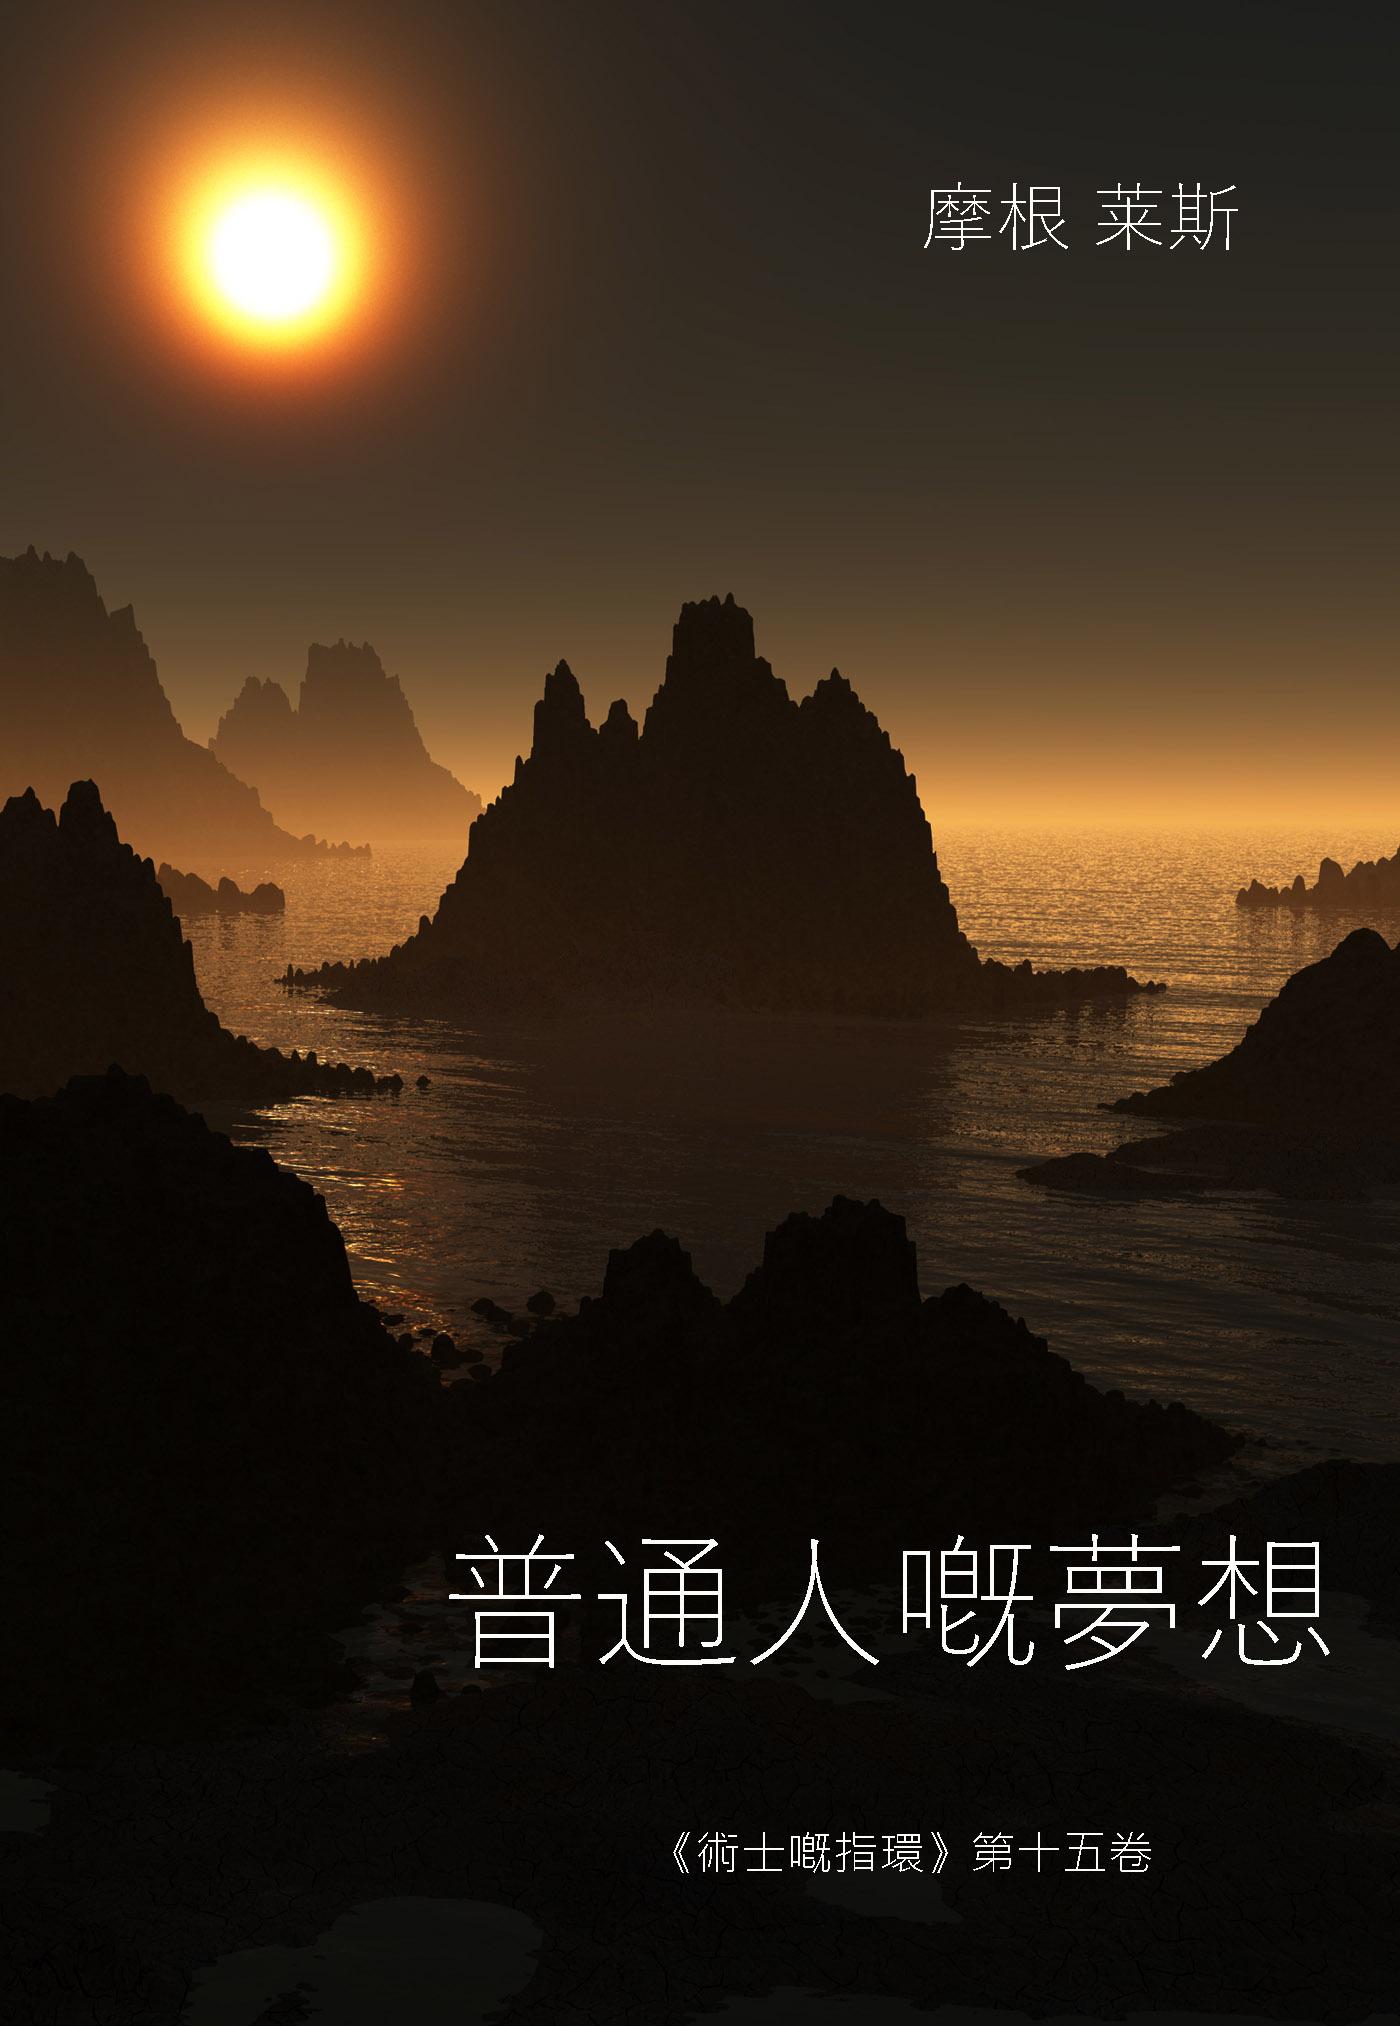 Морган Райс 普通人的夢想 政治学与行政学系列教材:中国近现代政治思想史